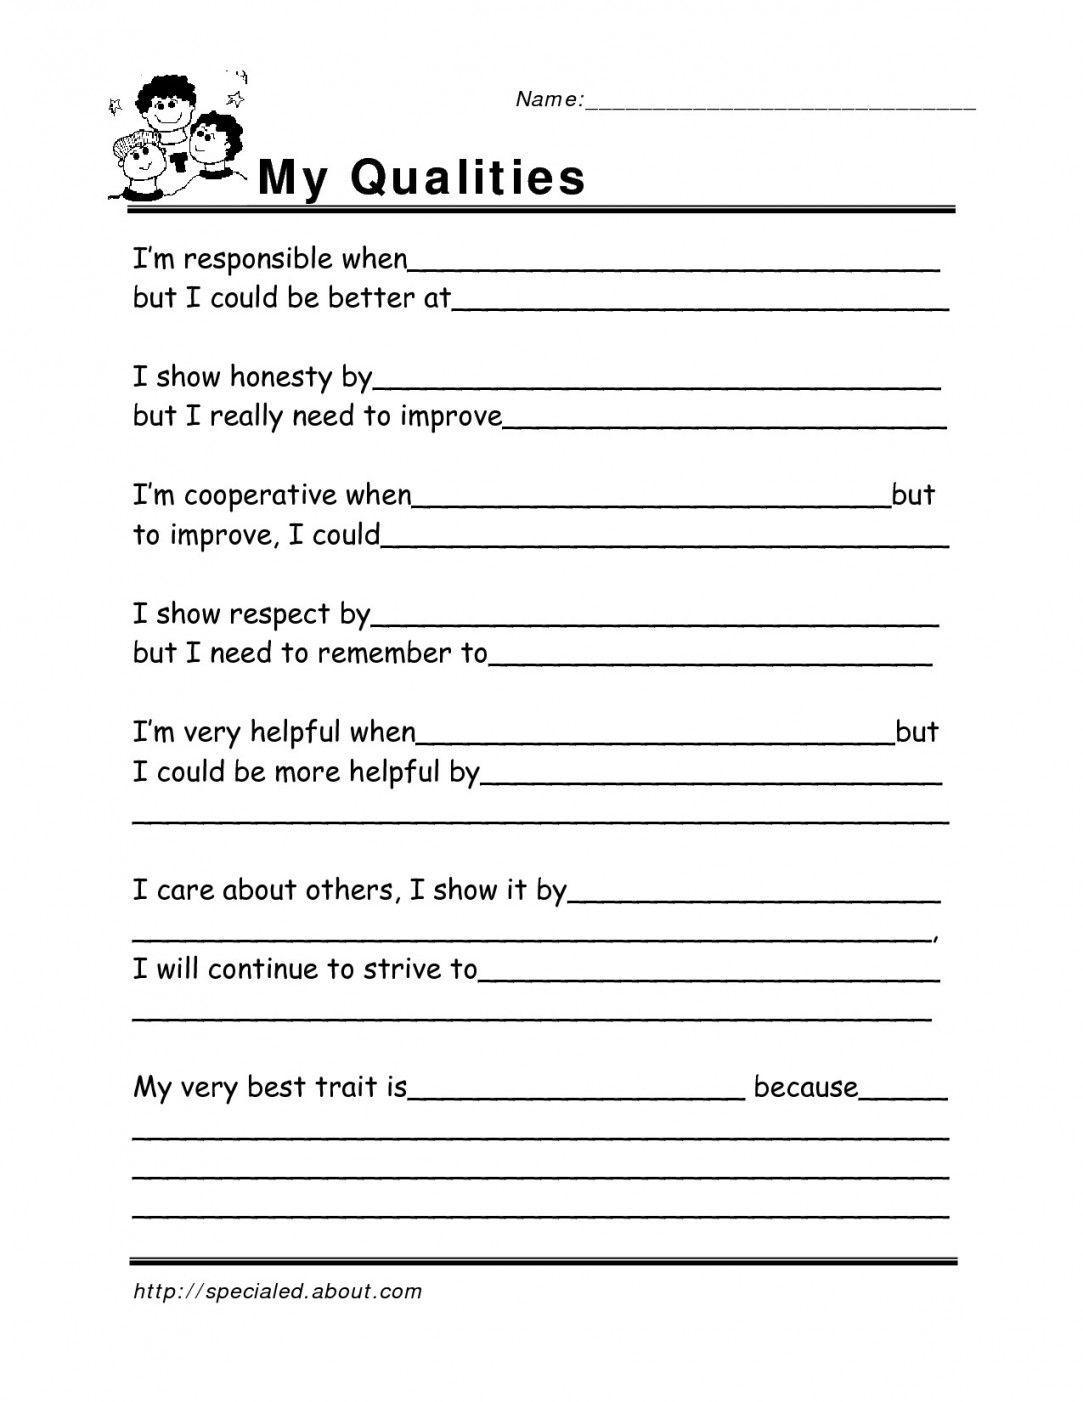 Free Printable Coping Skills Worksheets